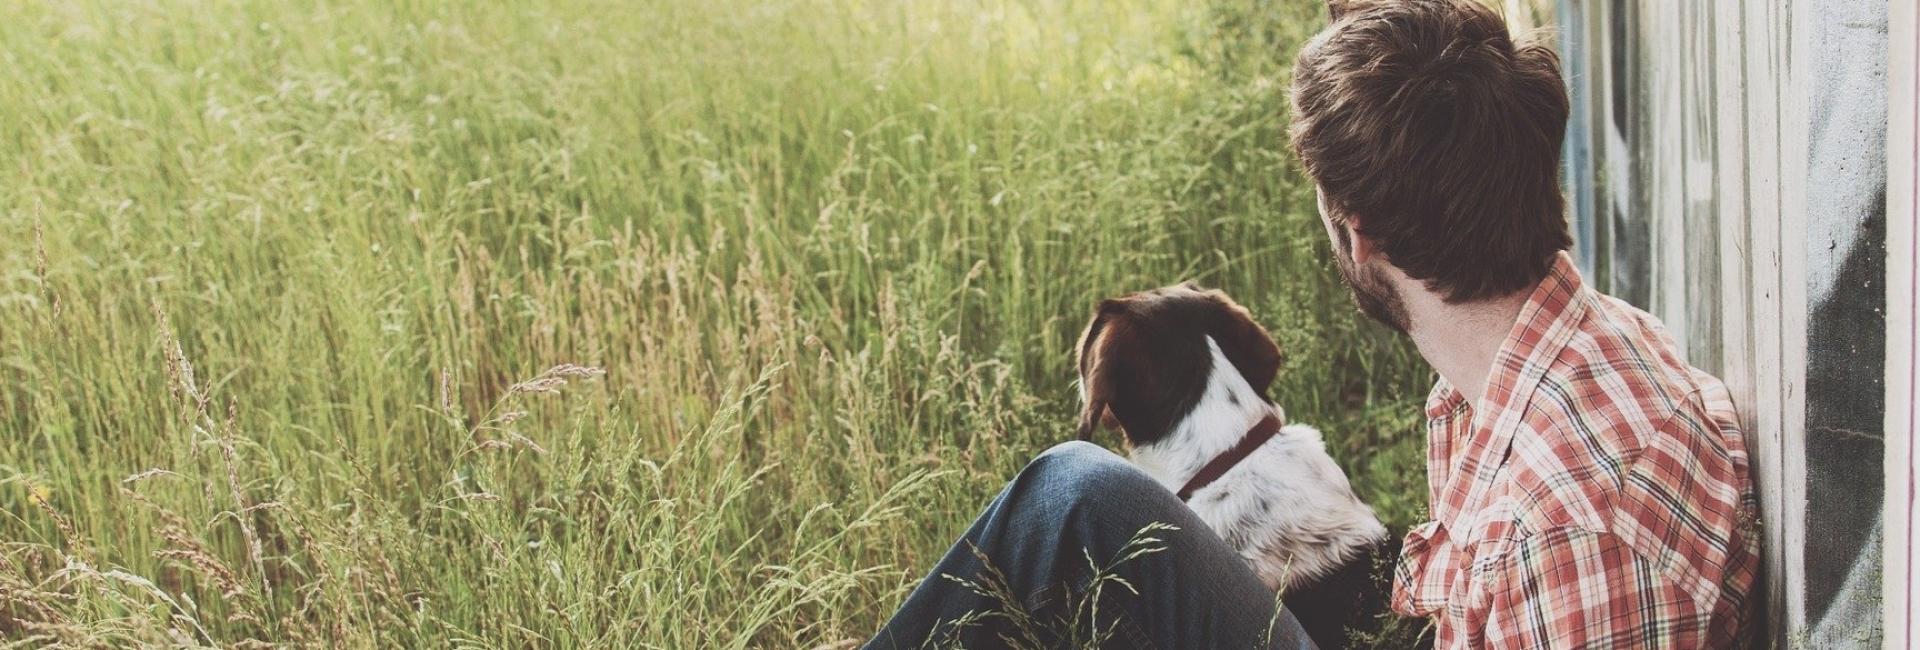 man en hond in het gras